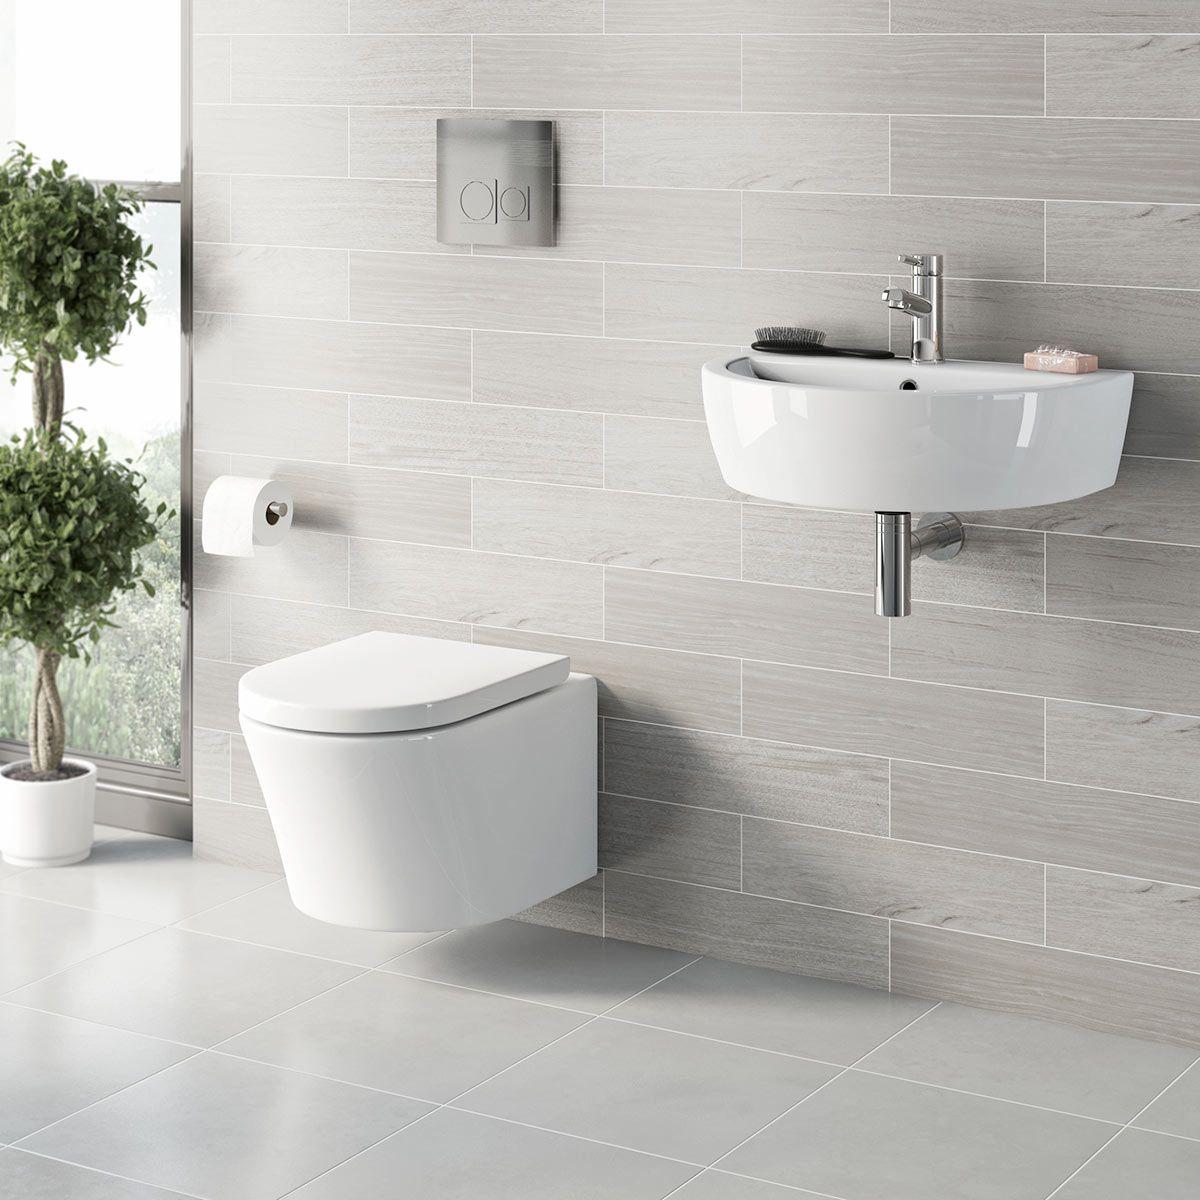 Wall Hanging Toilet frontline metro wall hung toilet & basin suite | hlíðarvegur